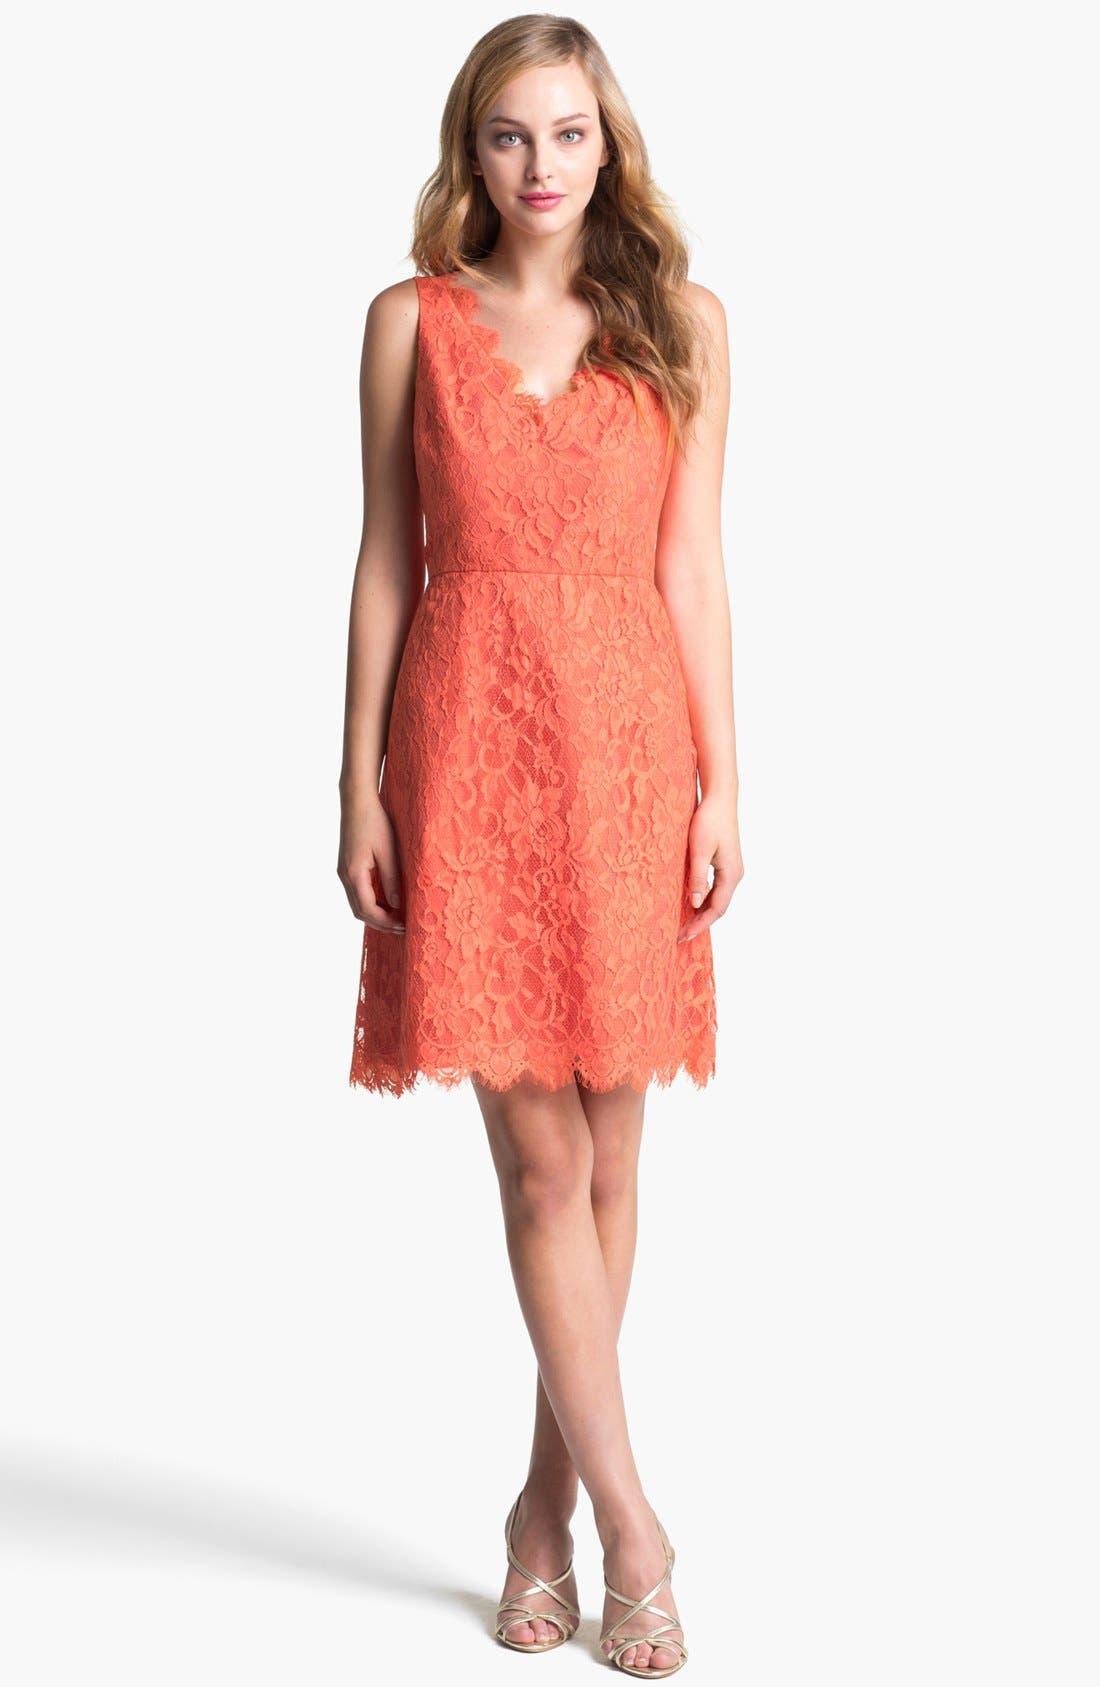 Alternate Image 1 Selected - ML Monique Lhuillier Lace Fit & Flare Dress